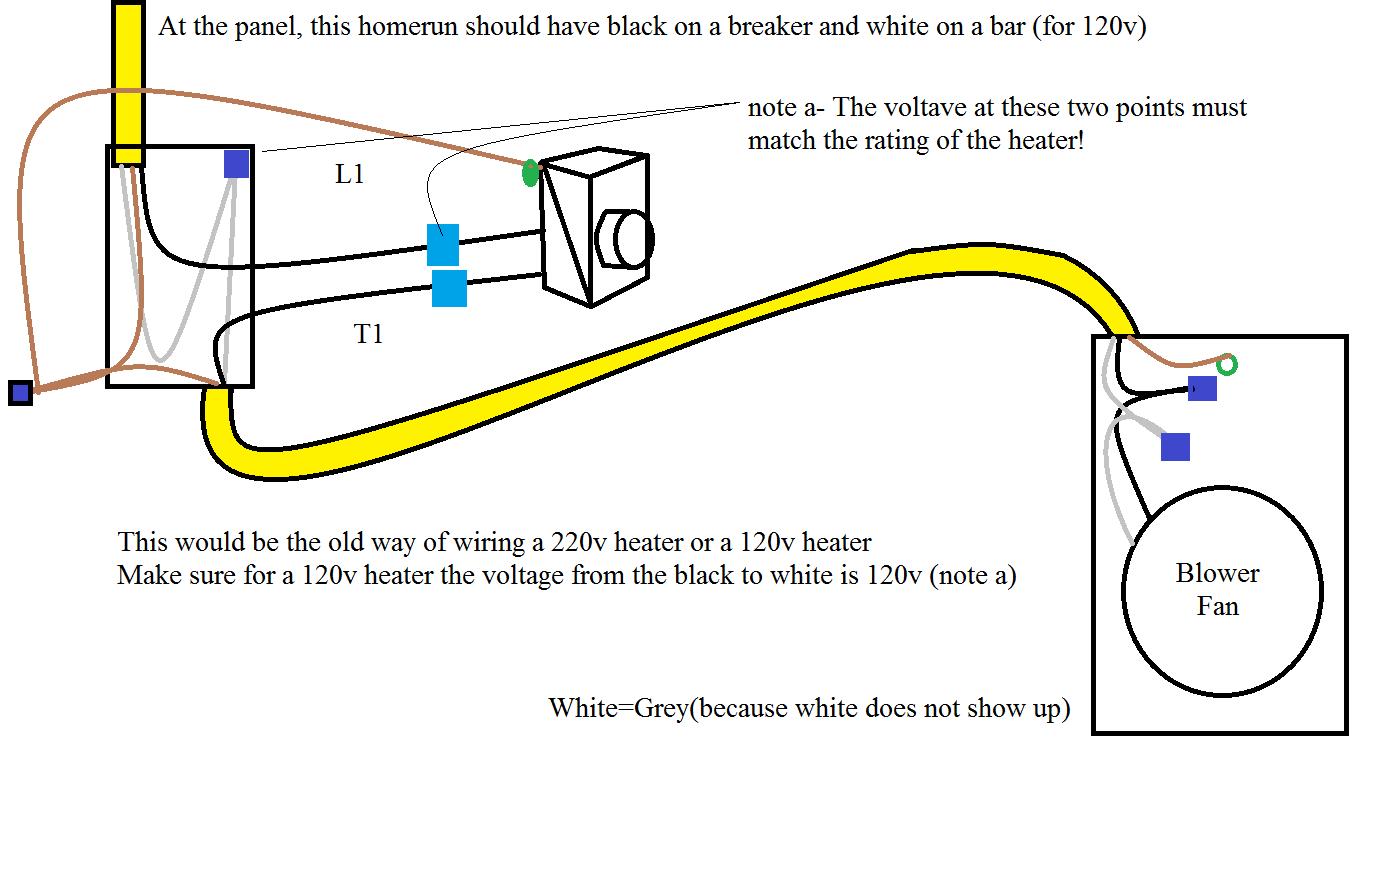 Honeywell baseboard thermostat wiring diagram somurich 220 volt baseboard heater wiring diagram pdfrhsvlc 876 cheapraybanclubmaster Choice Image